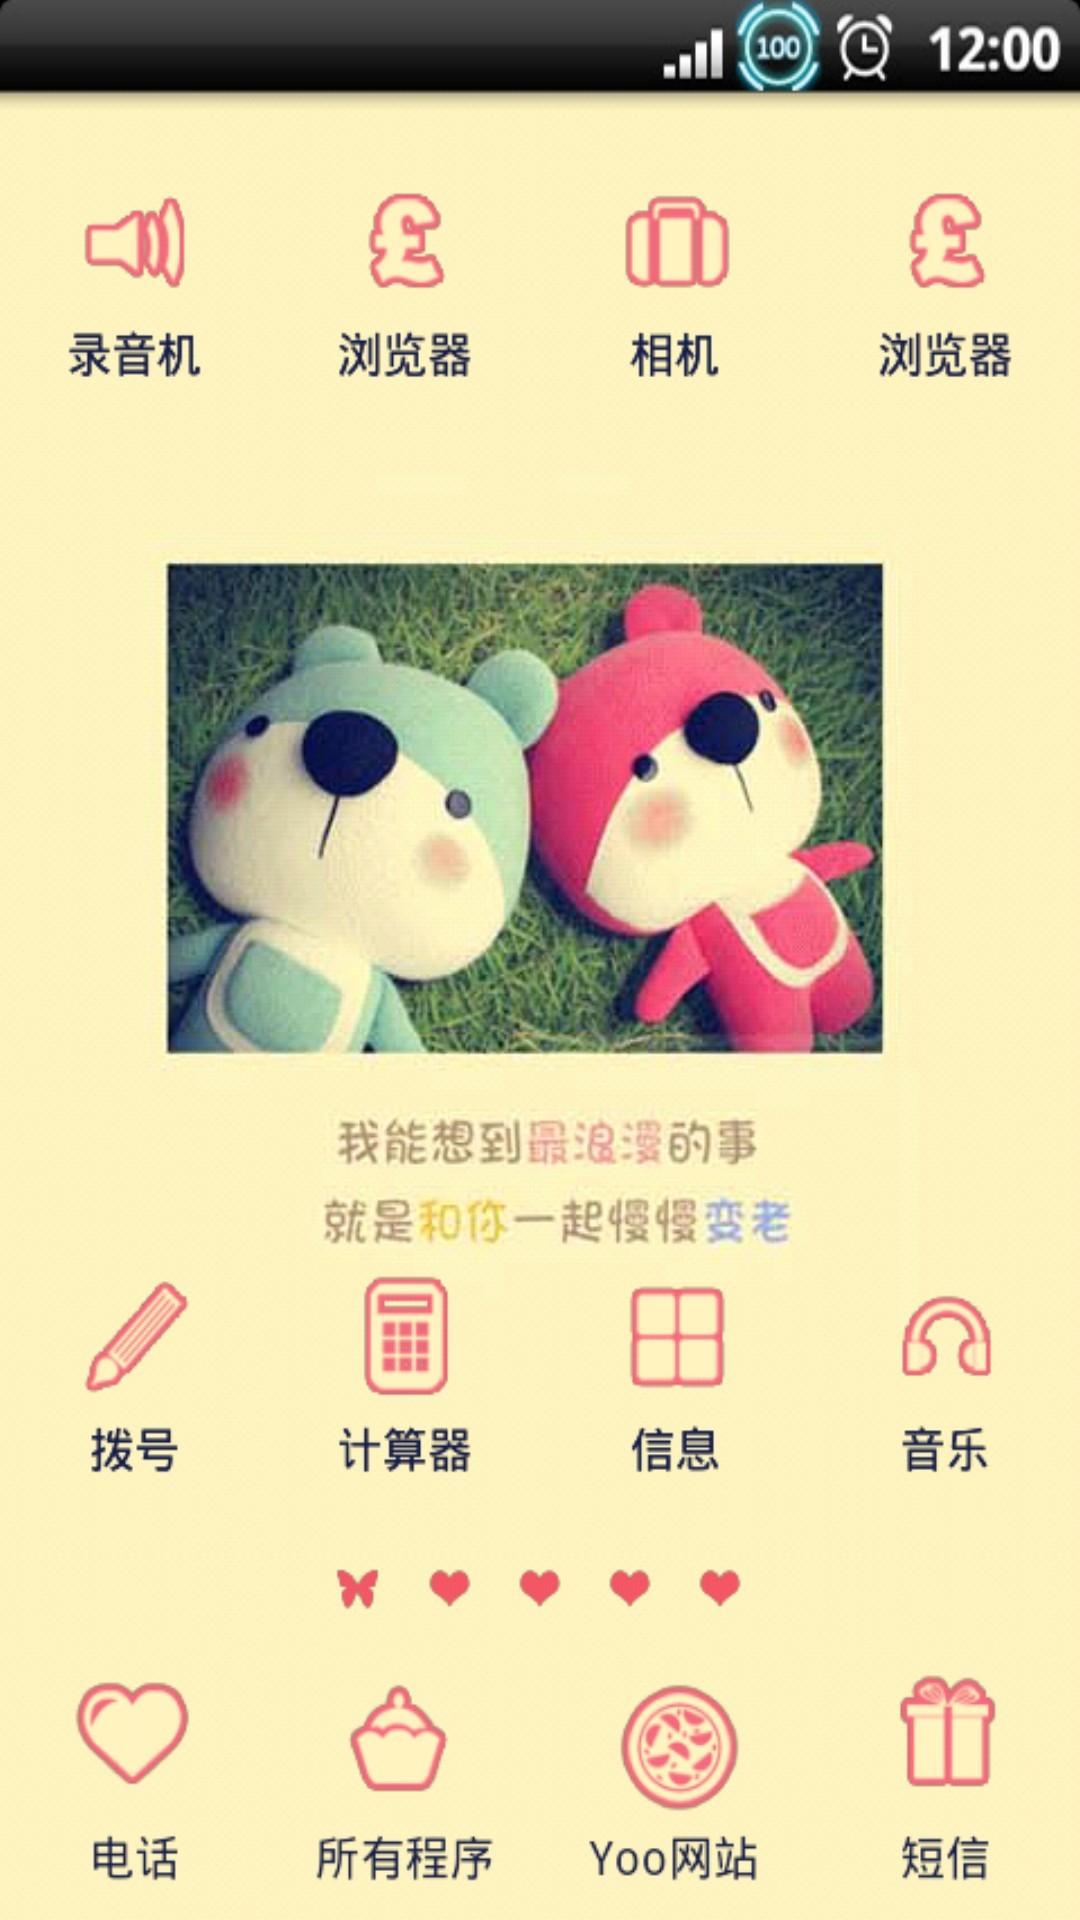 yoo主题-可爱情侣小熊下载_yoo主题-可爱情侣小熊手机